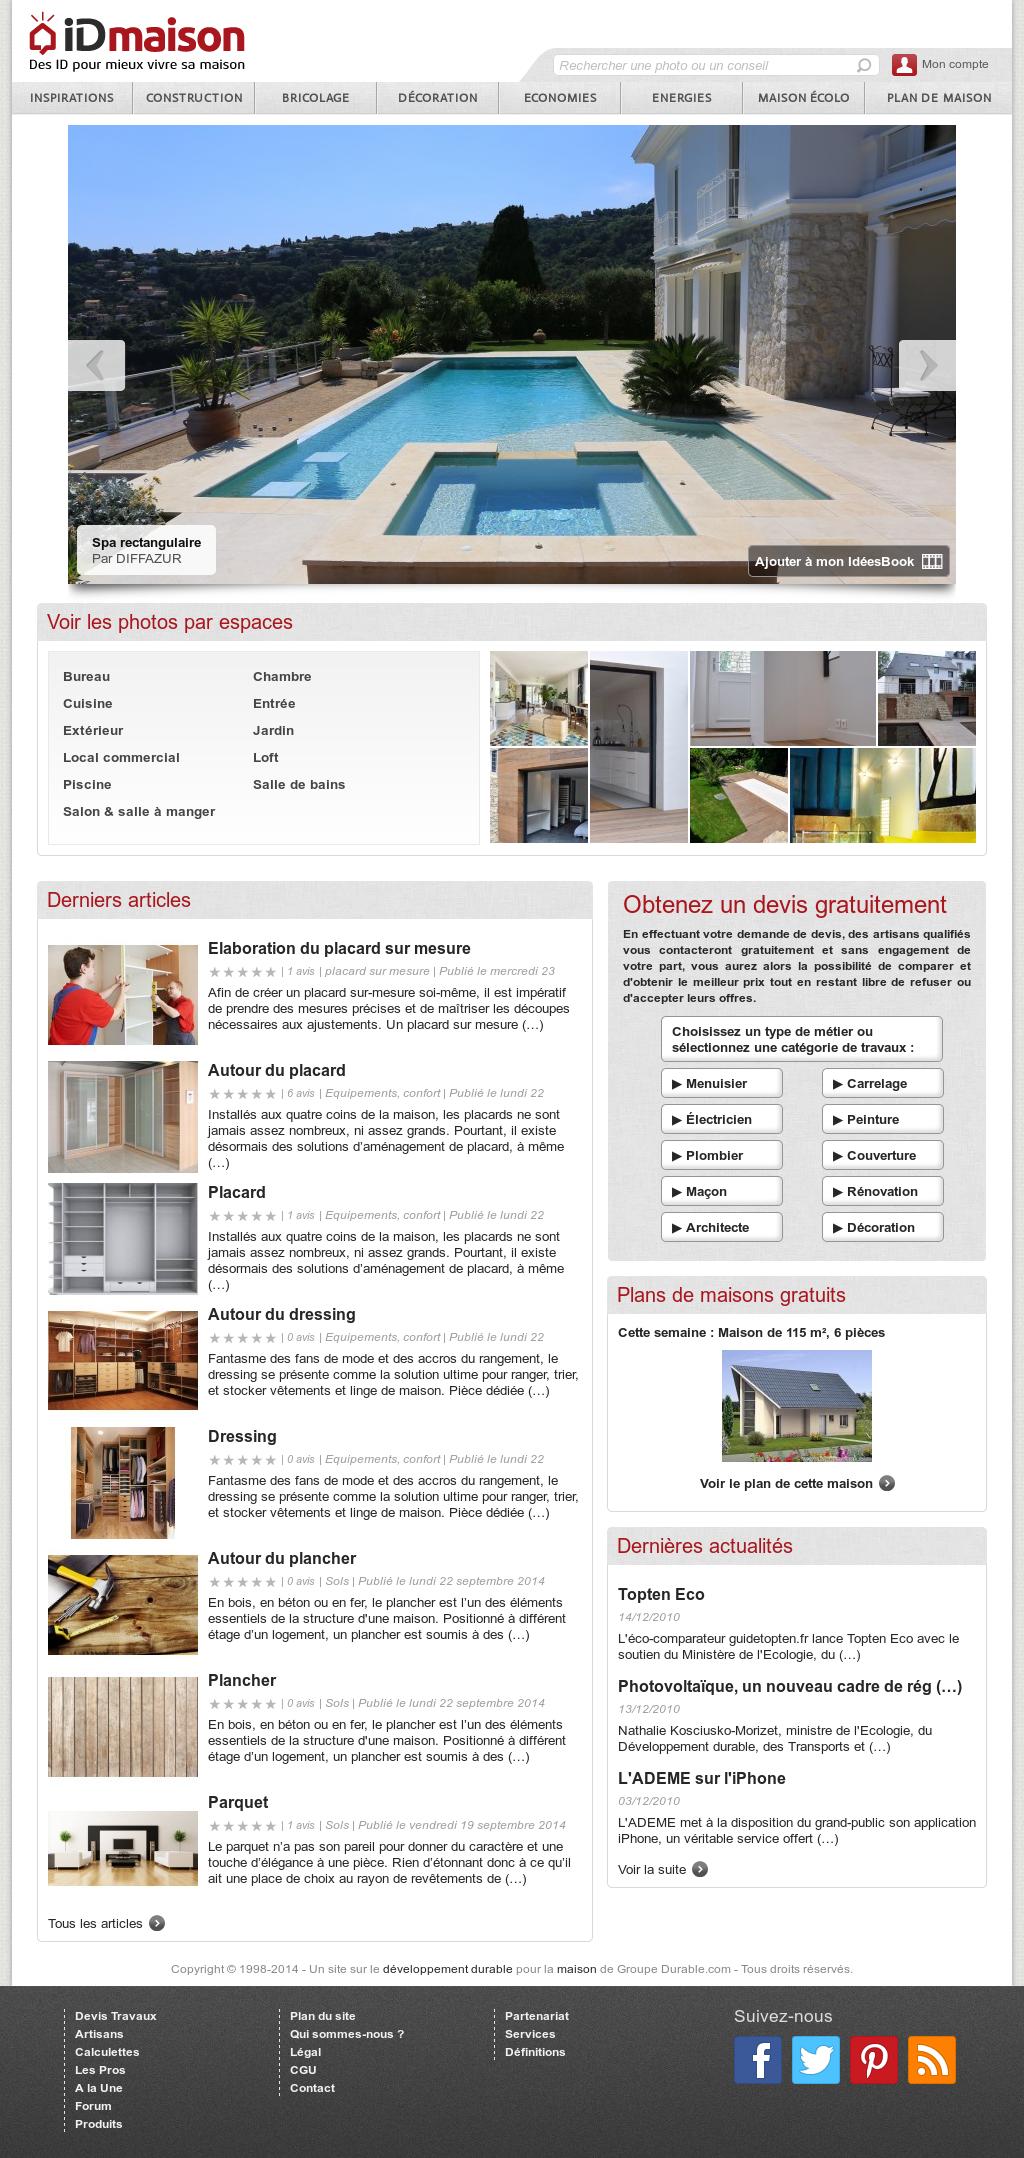 La Maison Du Dressing id maison competitors, revenue and employees - owler company